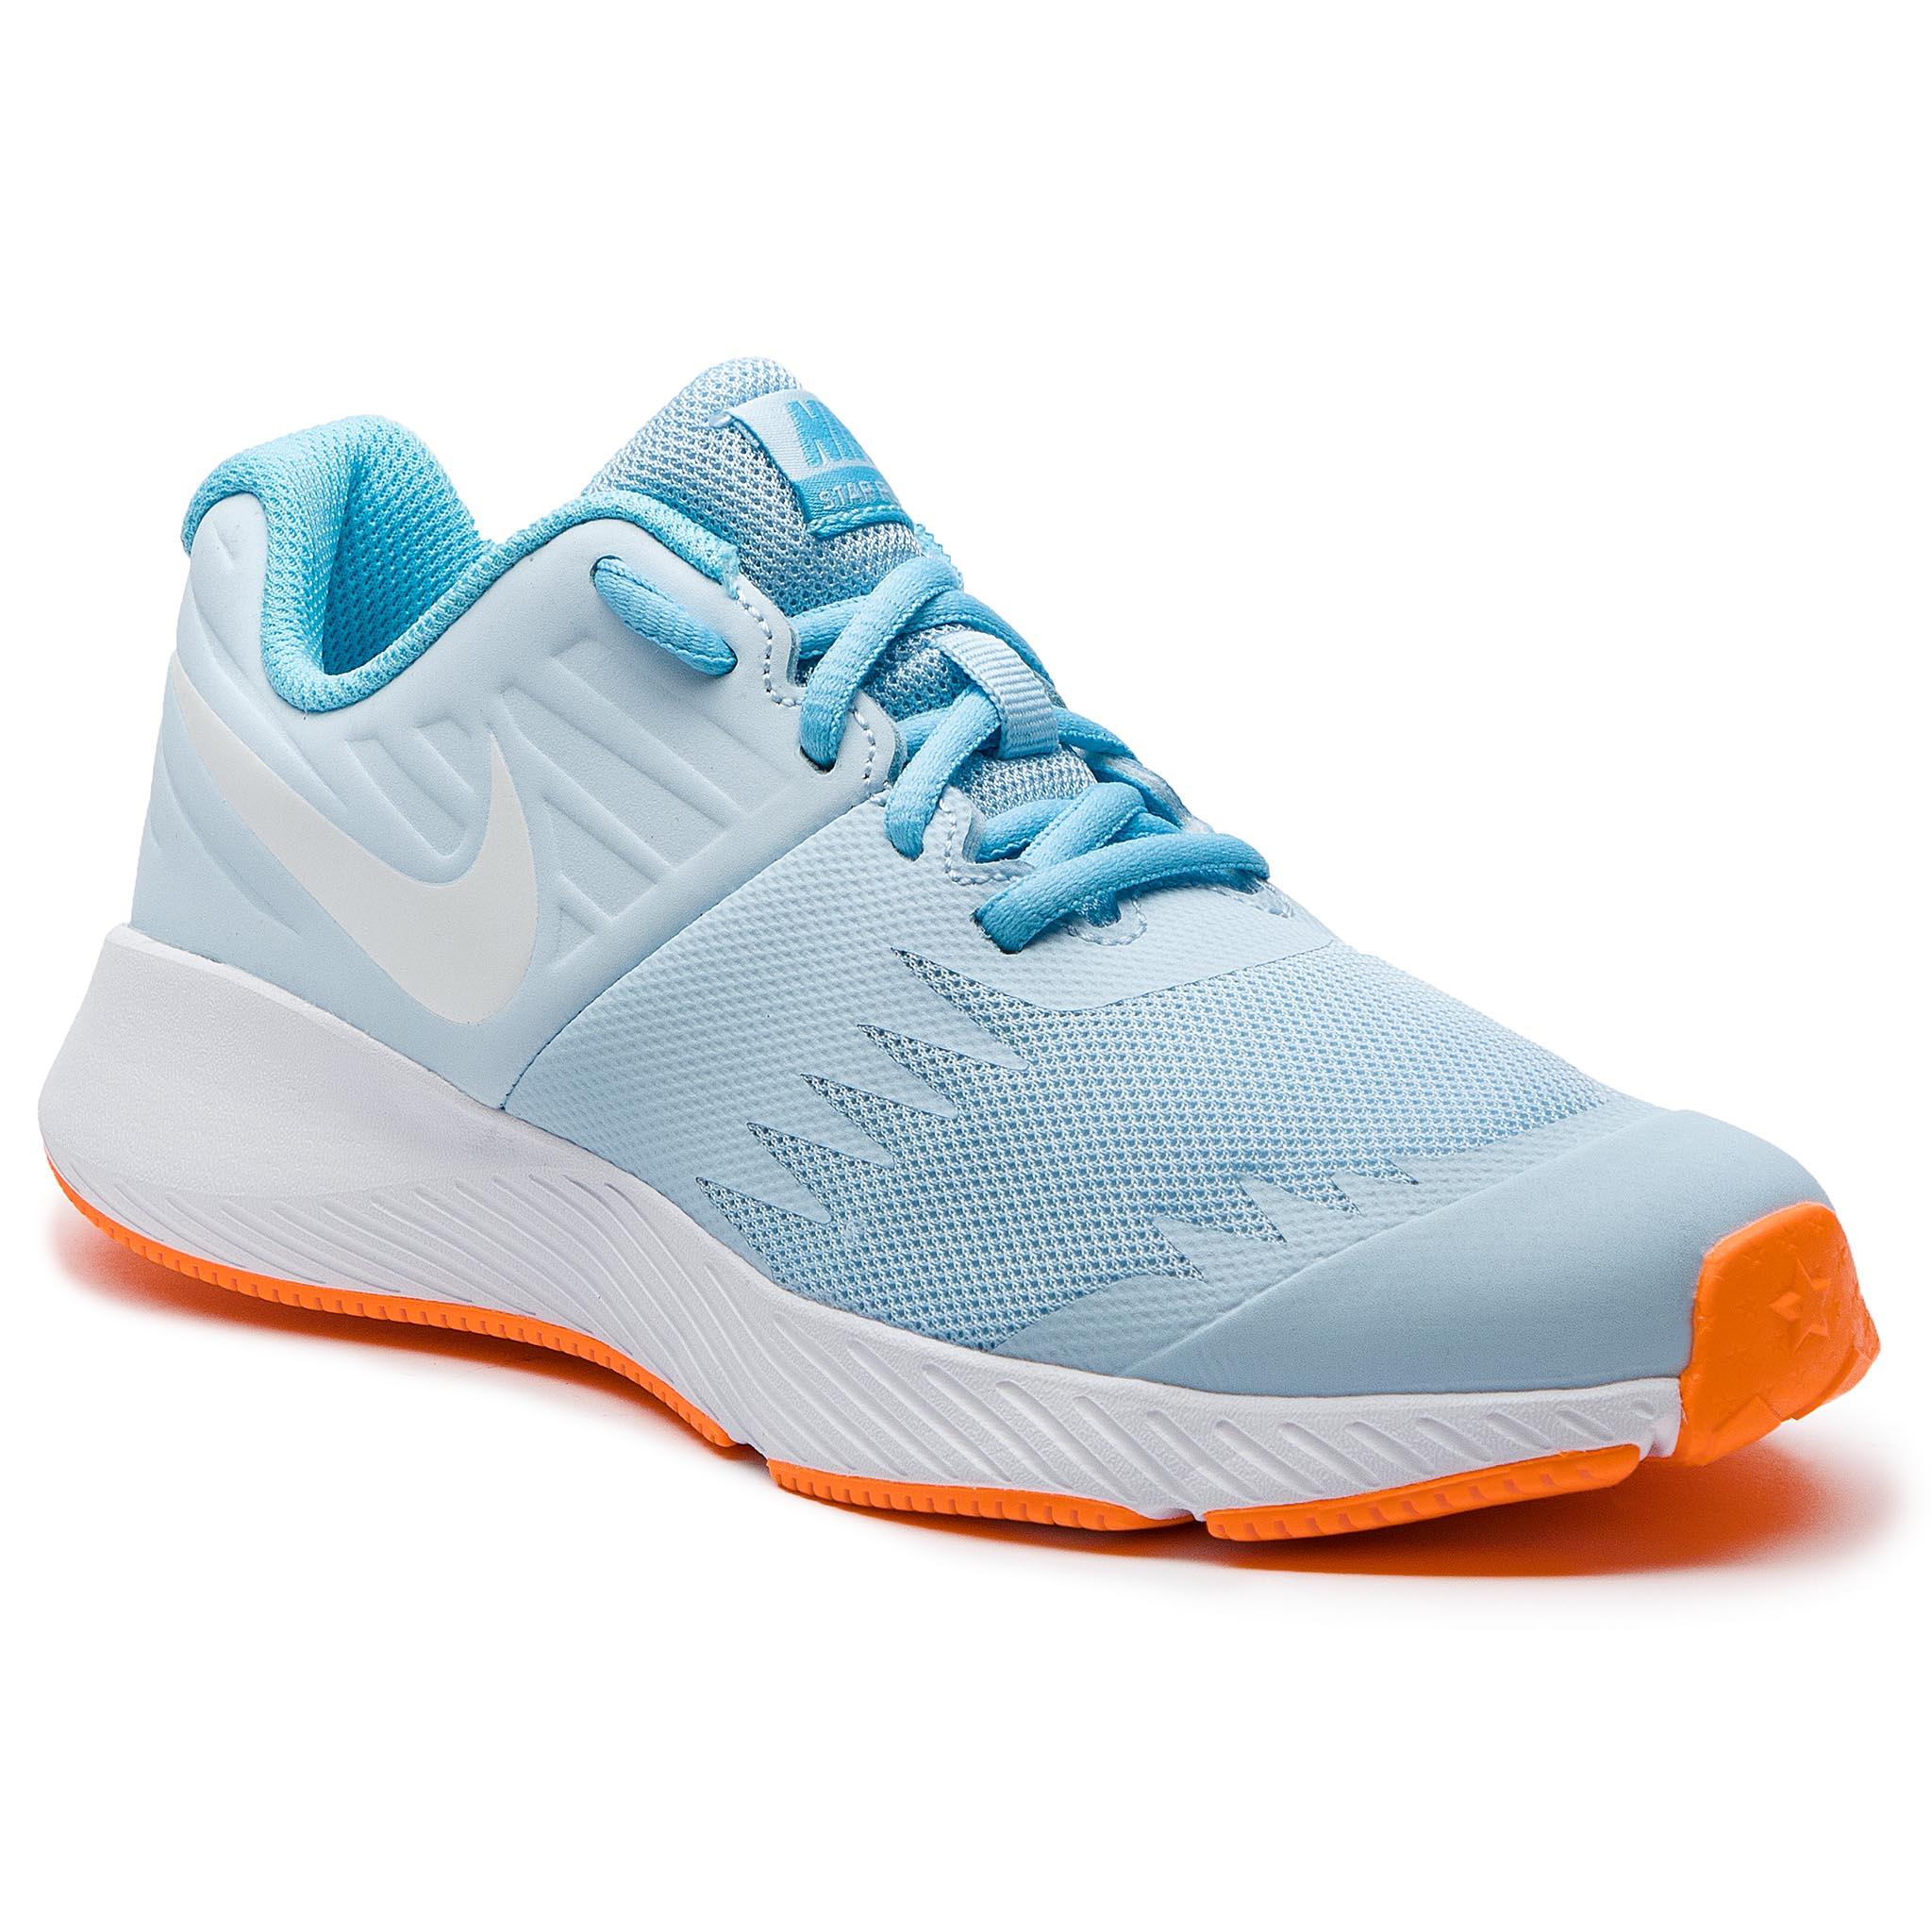 Boty NIKE - Star Runner (GS) 907257 404 Cobalt Tint White Blue Chill ... ed6a5d8a81